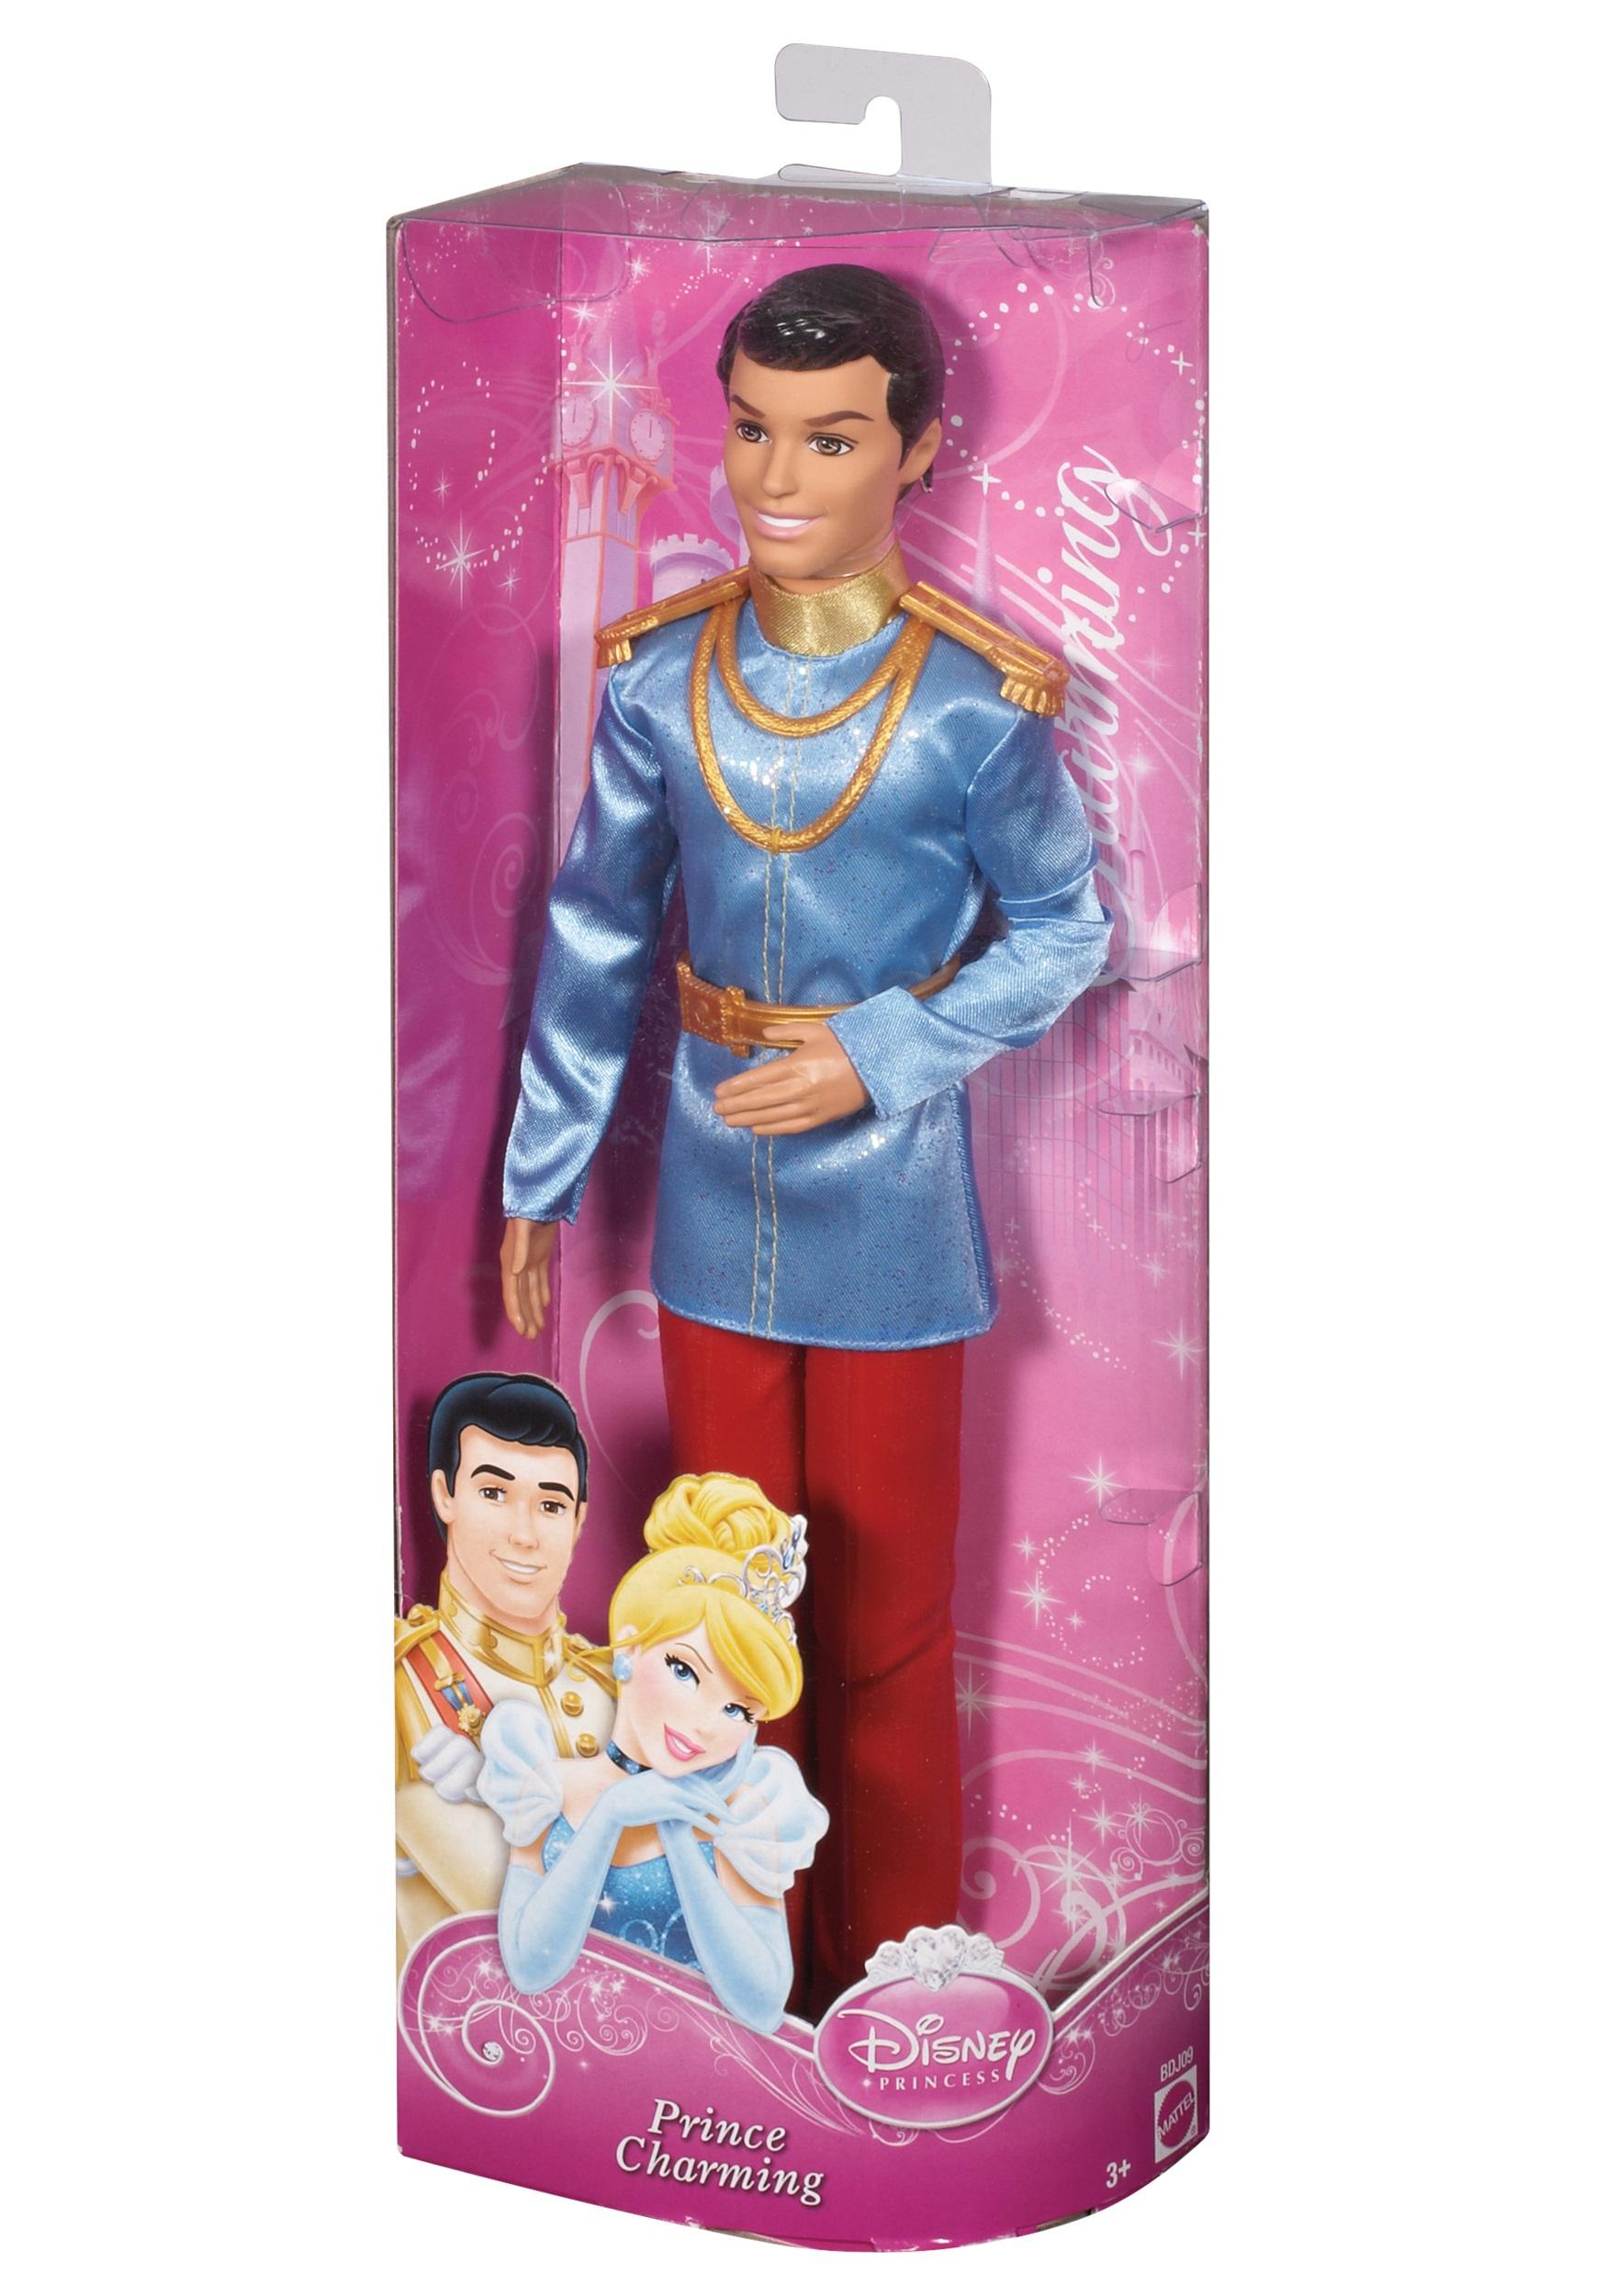 disney prince charming doll